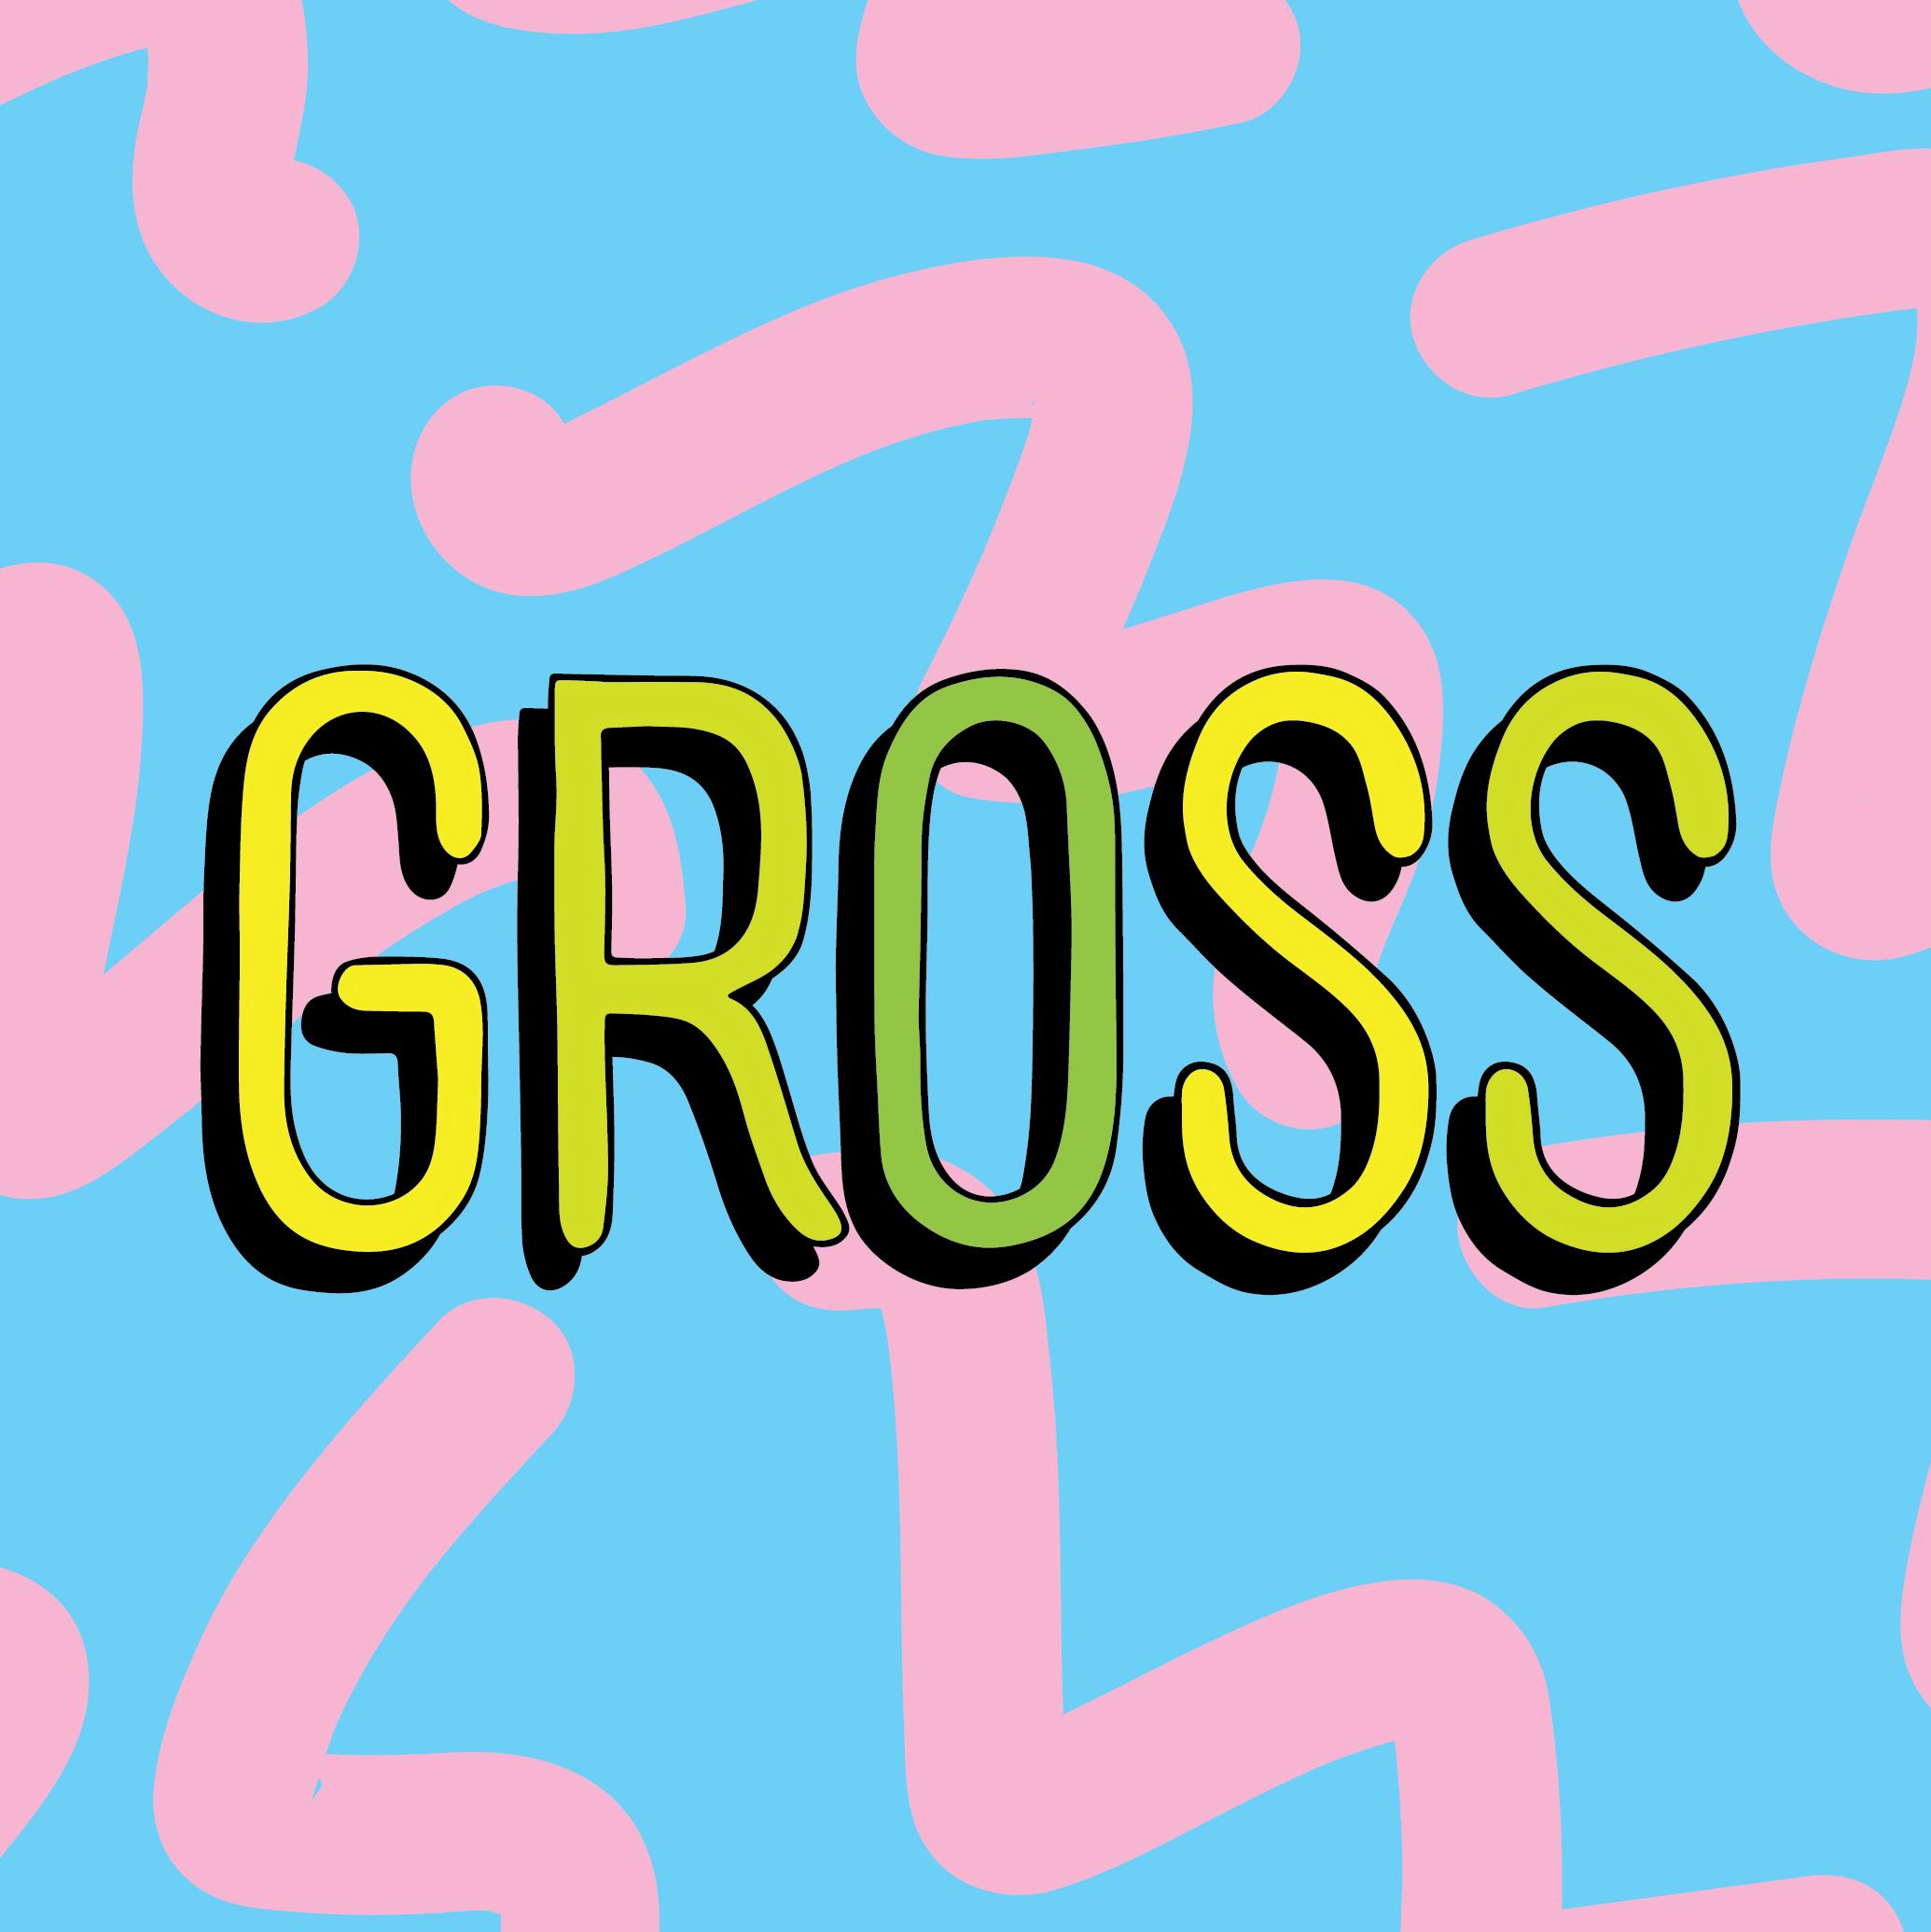 Gross-rgb-2.jpg